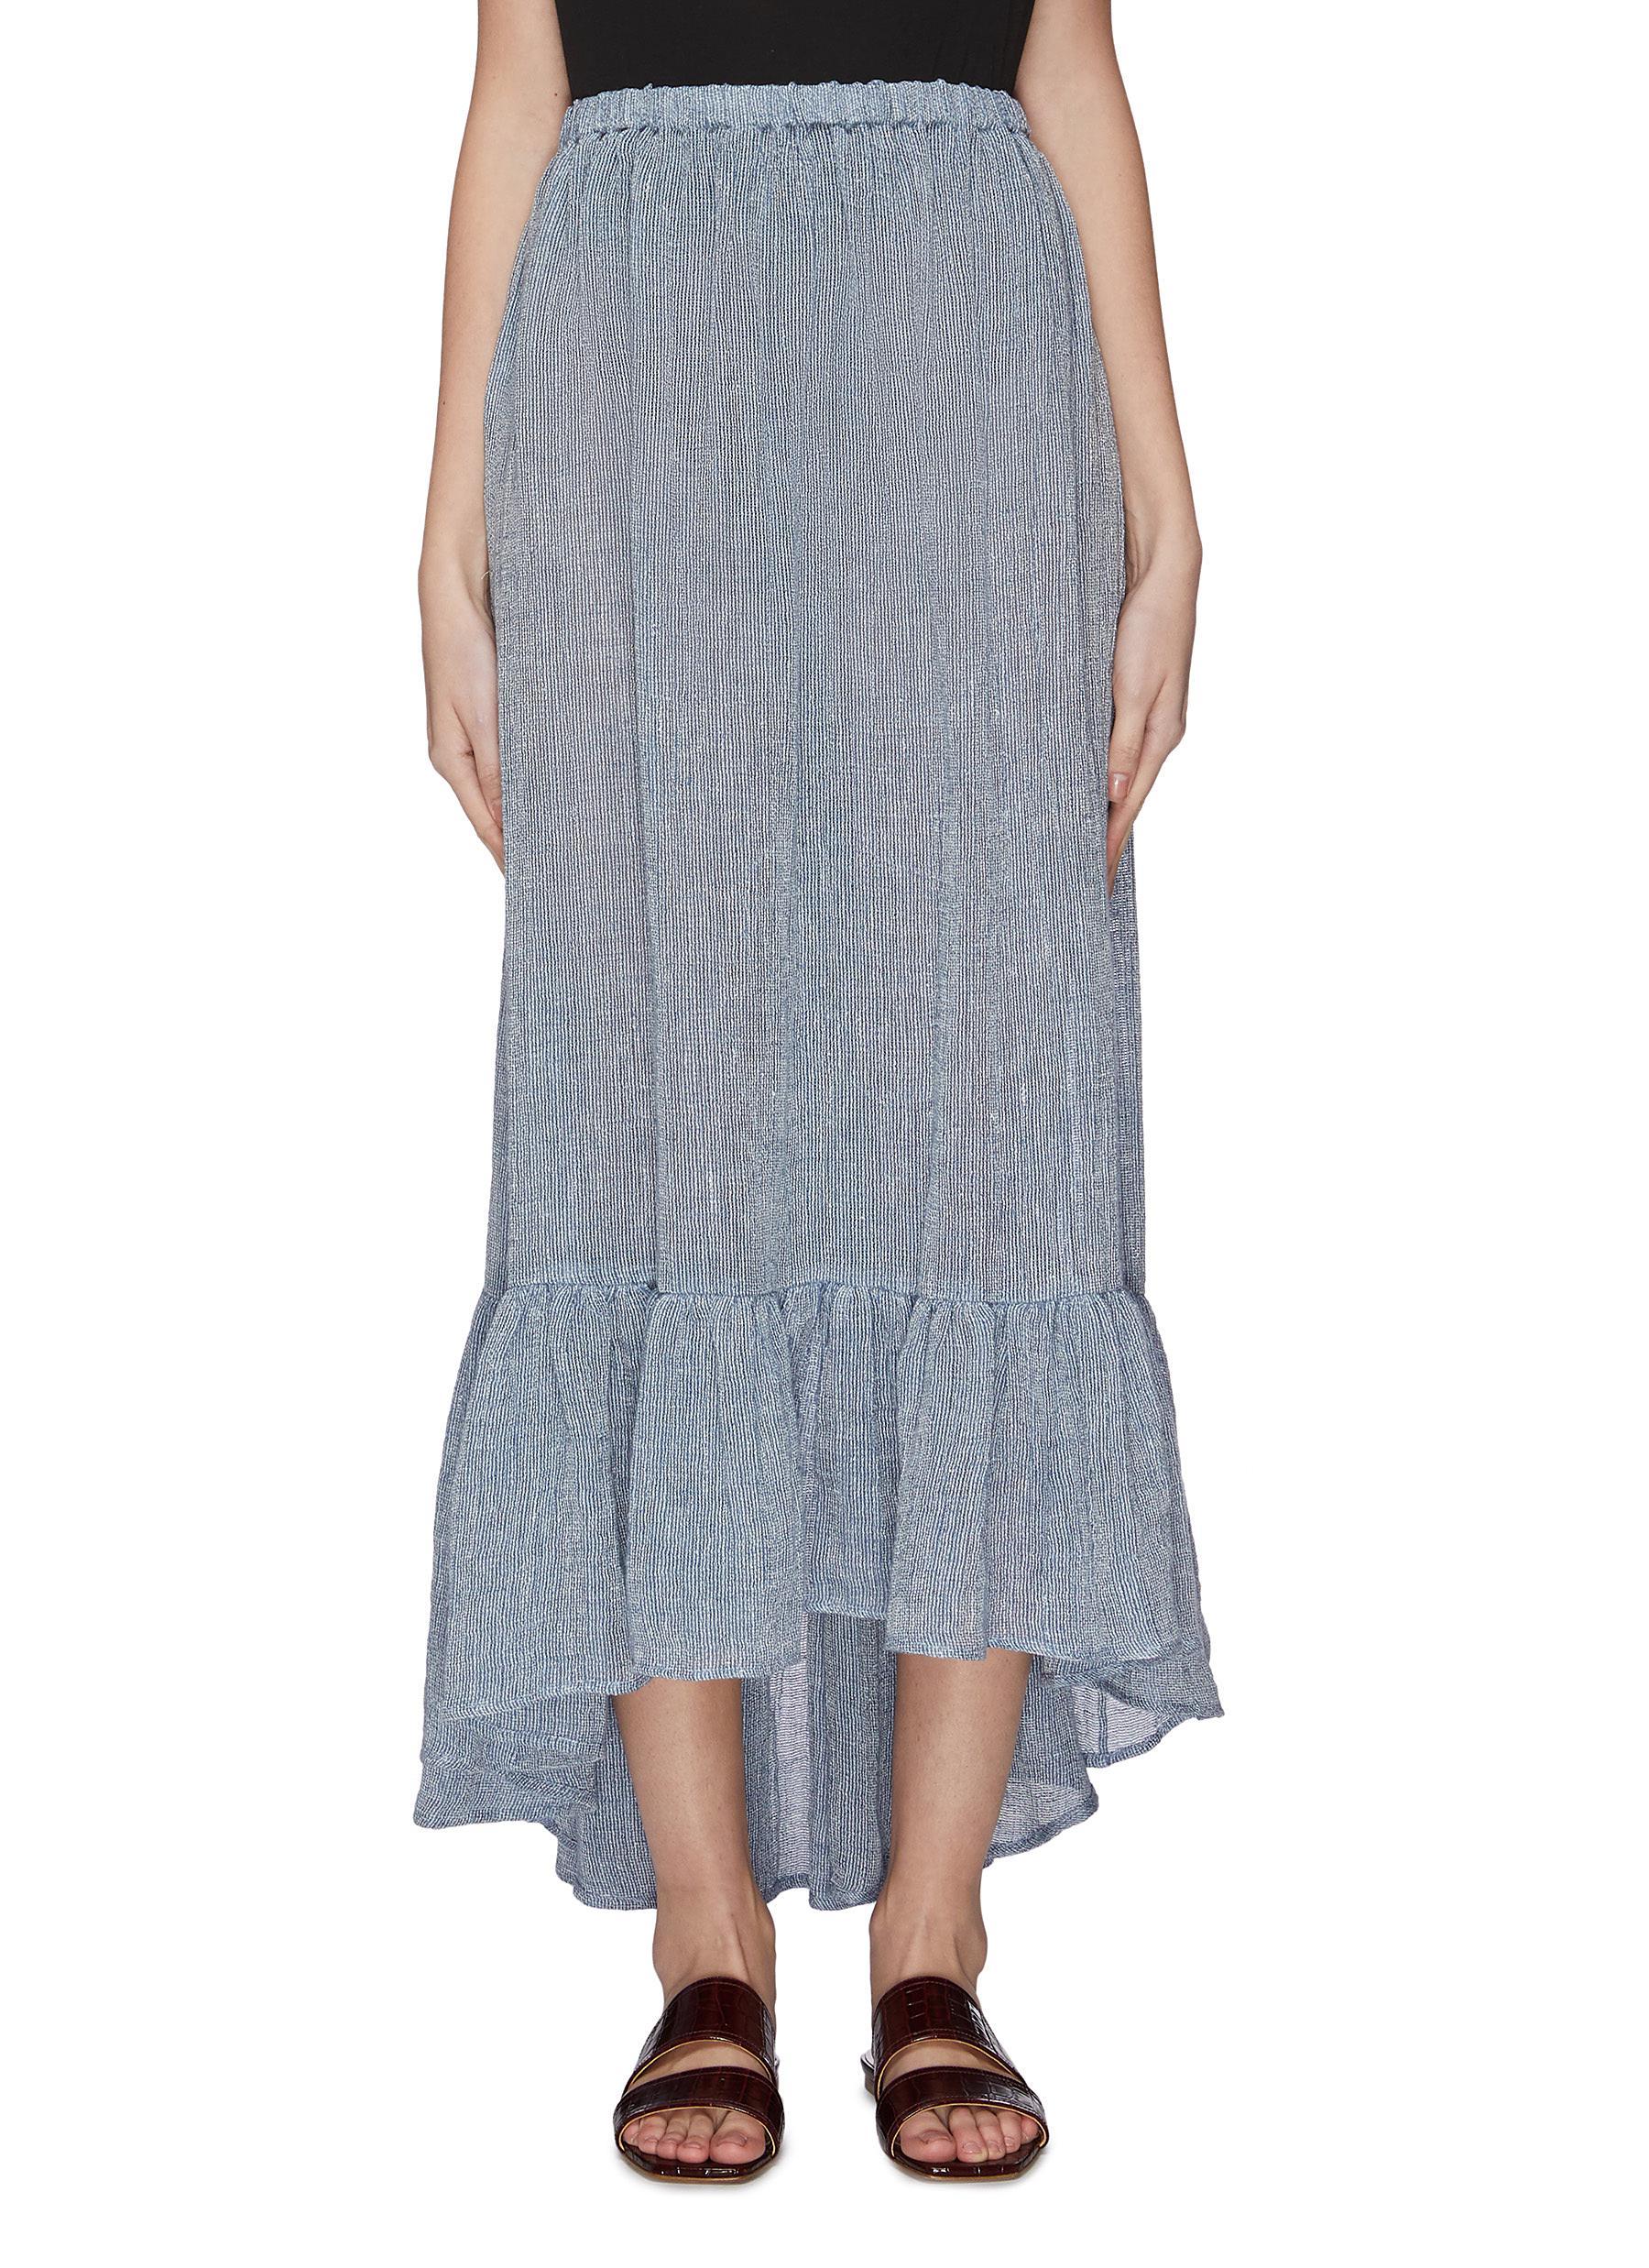 Buy Lisa Marie Fernandez Skirts 'Nicole' ruffle long skirt